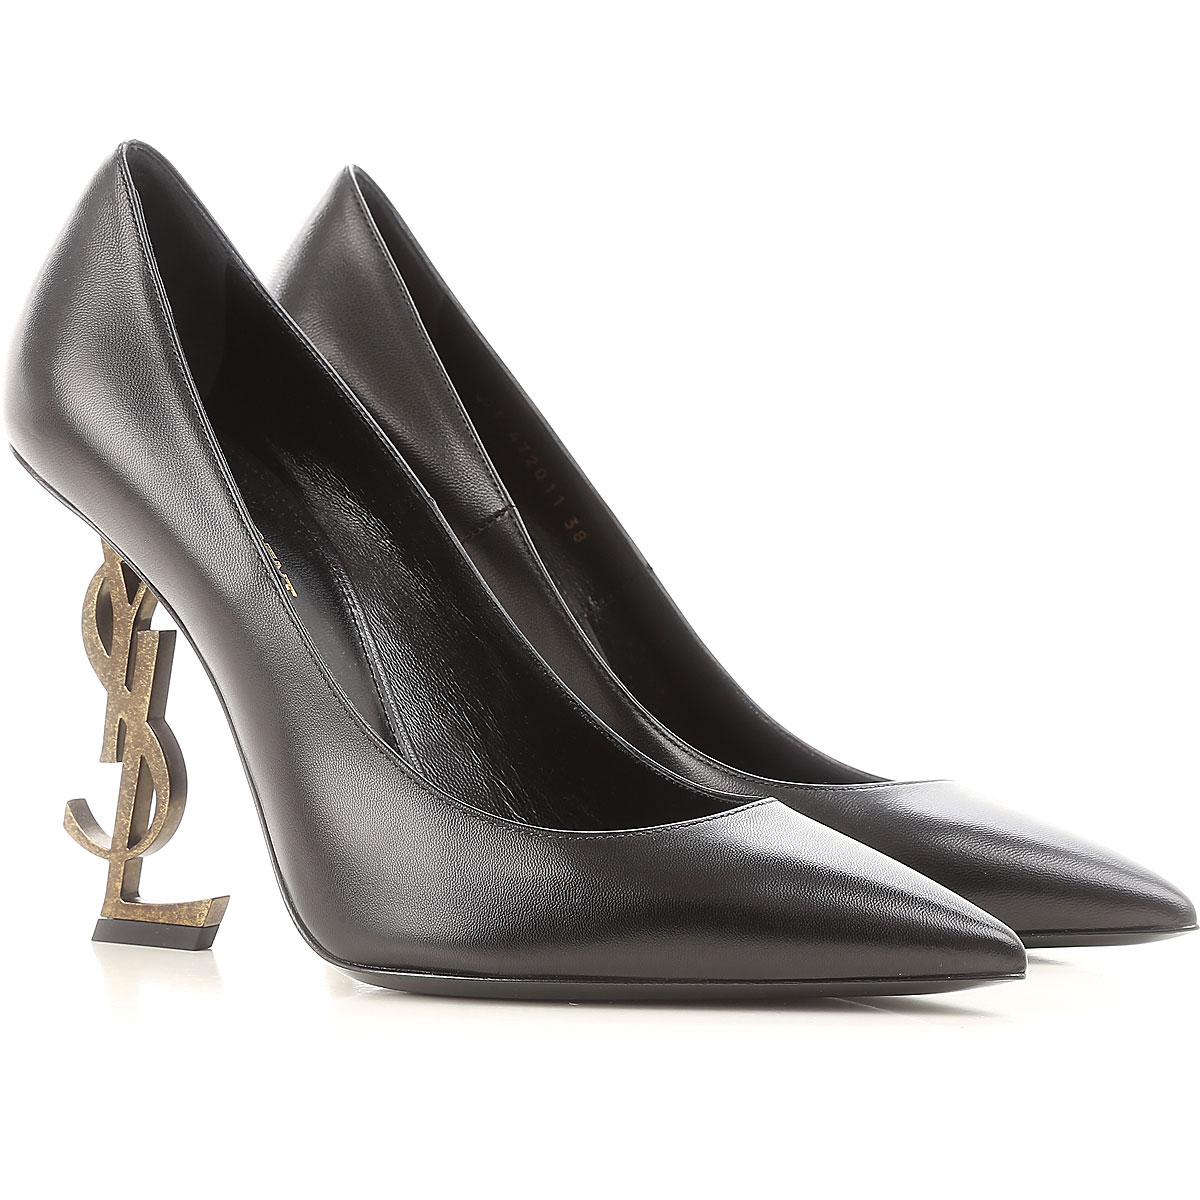 chaussures femme yves saint laurent code produit 472011 akptt 1000. Black Bedroom Furniture Sets. Home Design Ideas